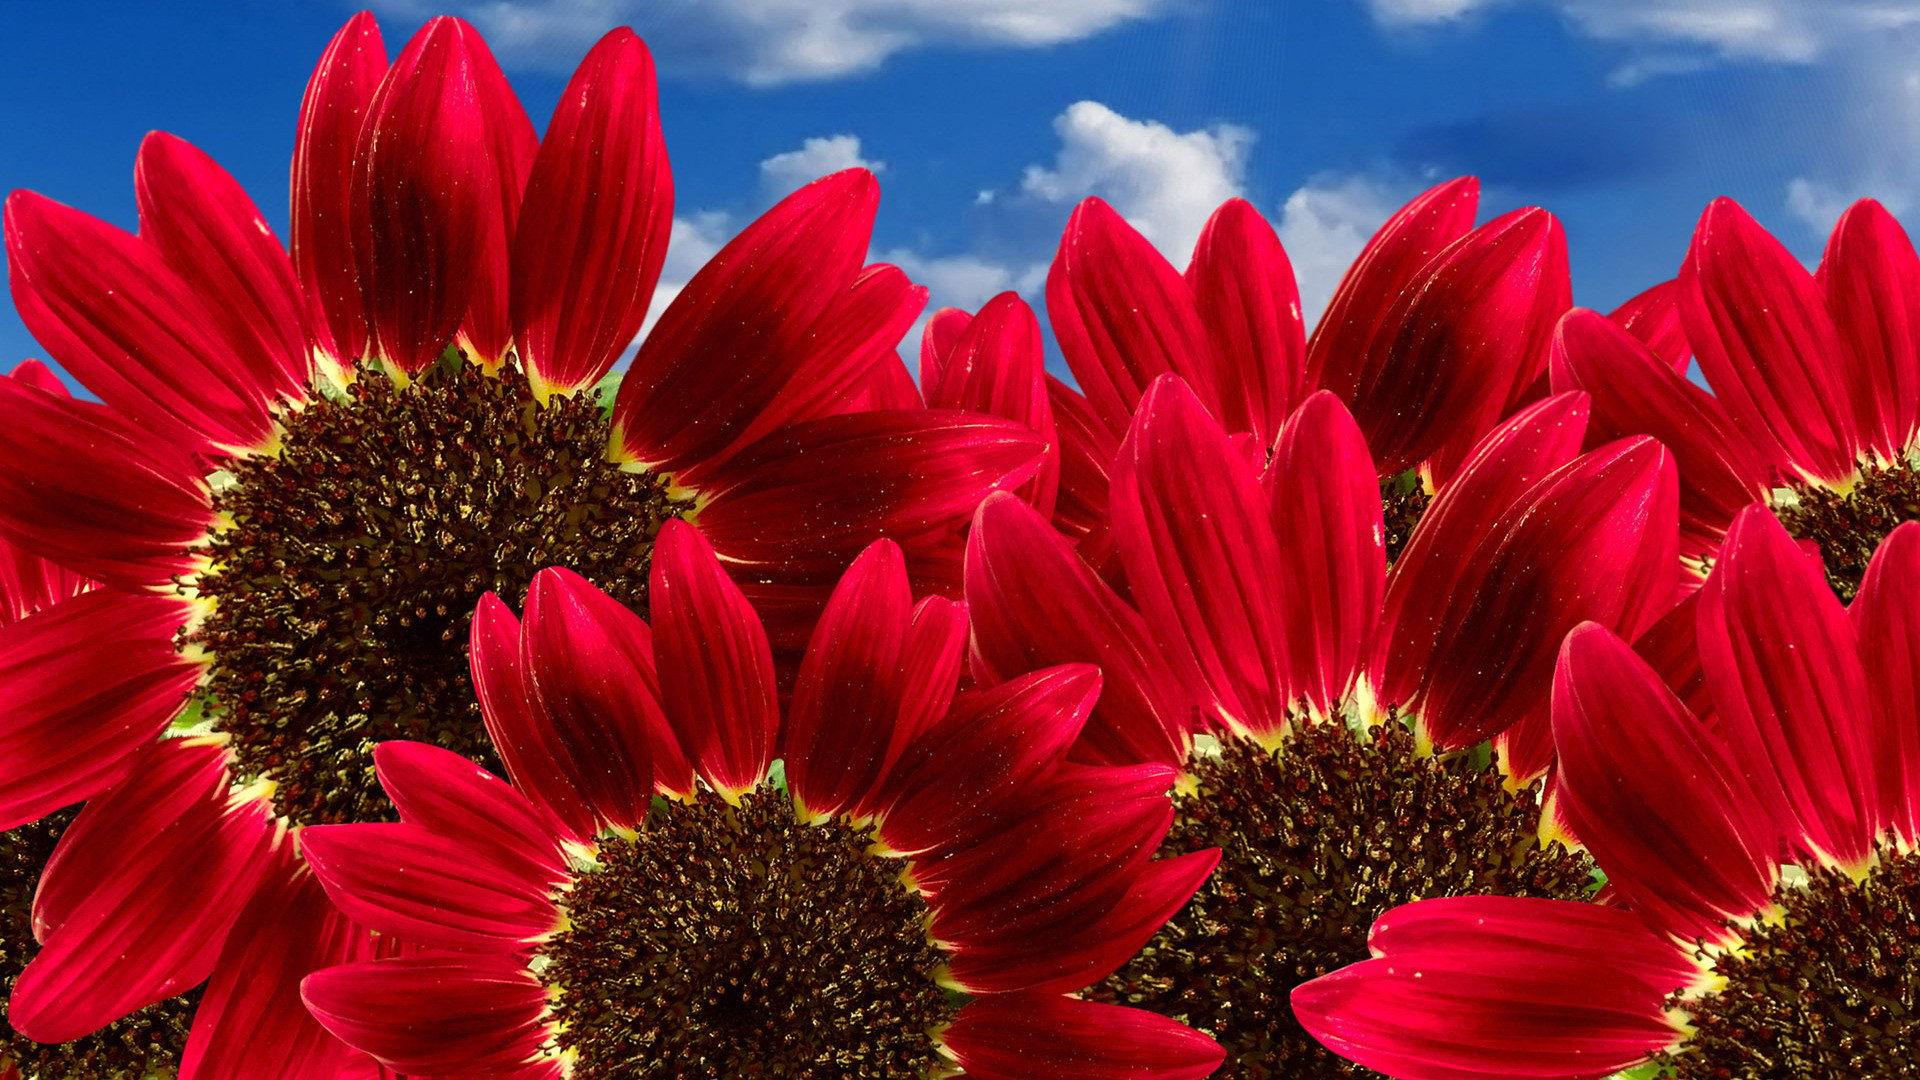 بالصور صور ورود جميلة , اجمل صور للورد 3265 6